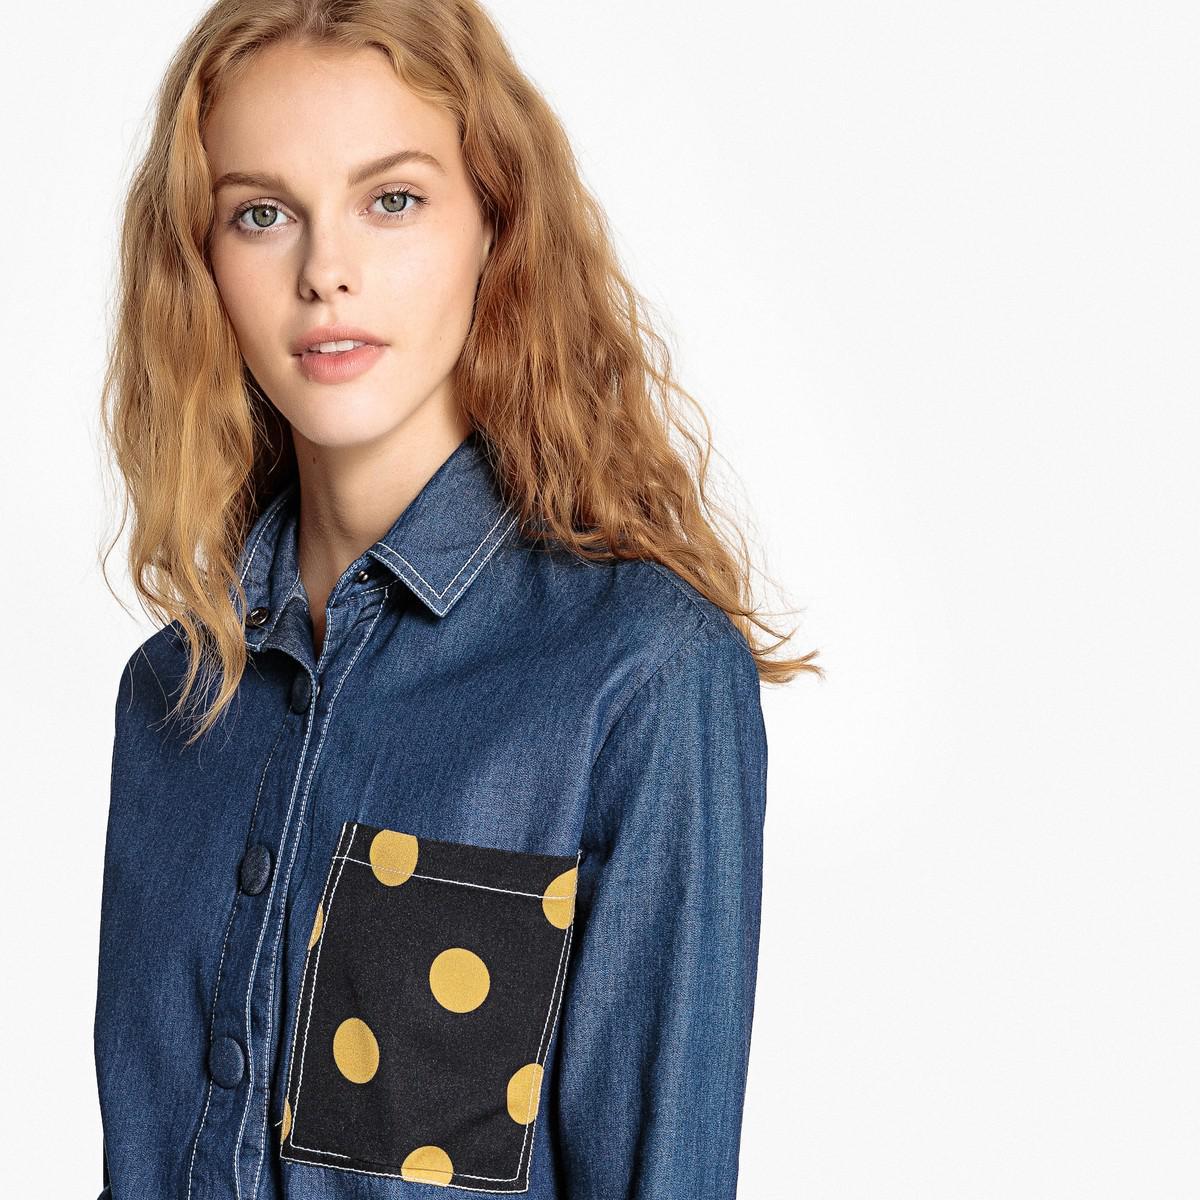 71551c4c0c3 Lyst - La Redoute Short Denim Shirt With Polka Dot Pocket in Blue